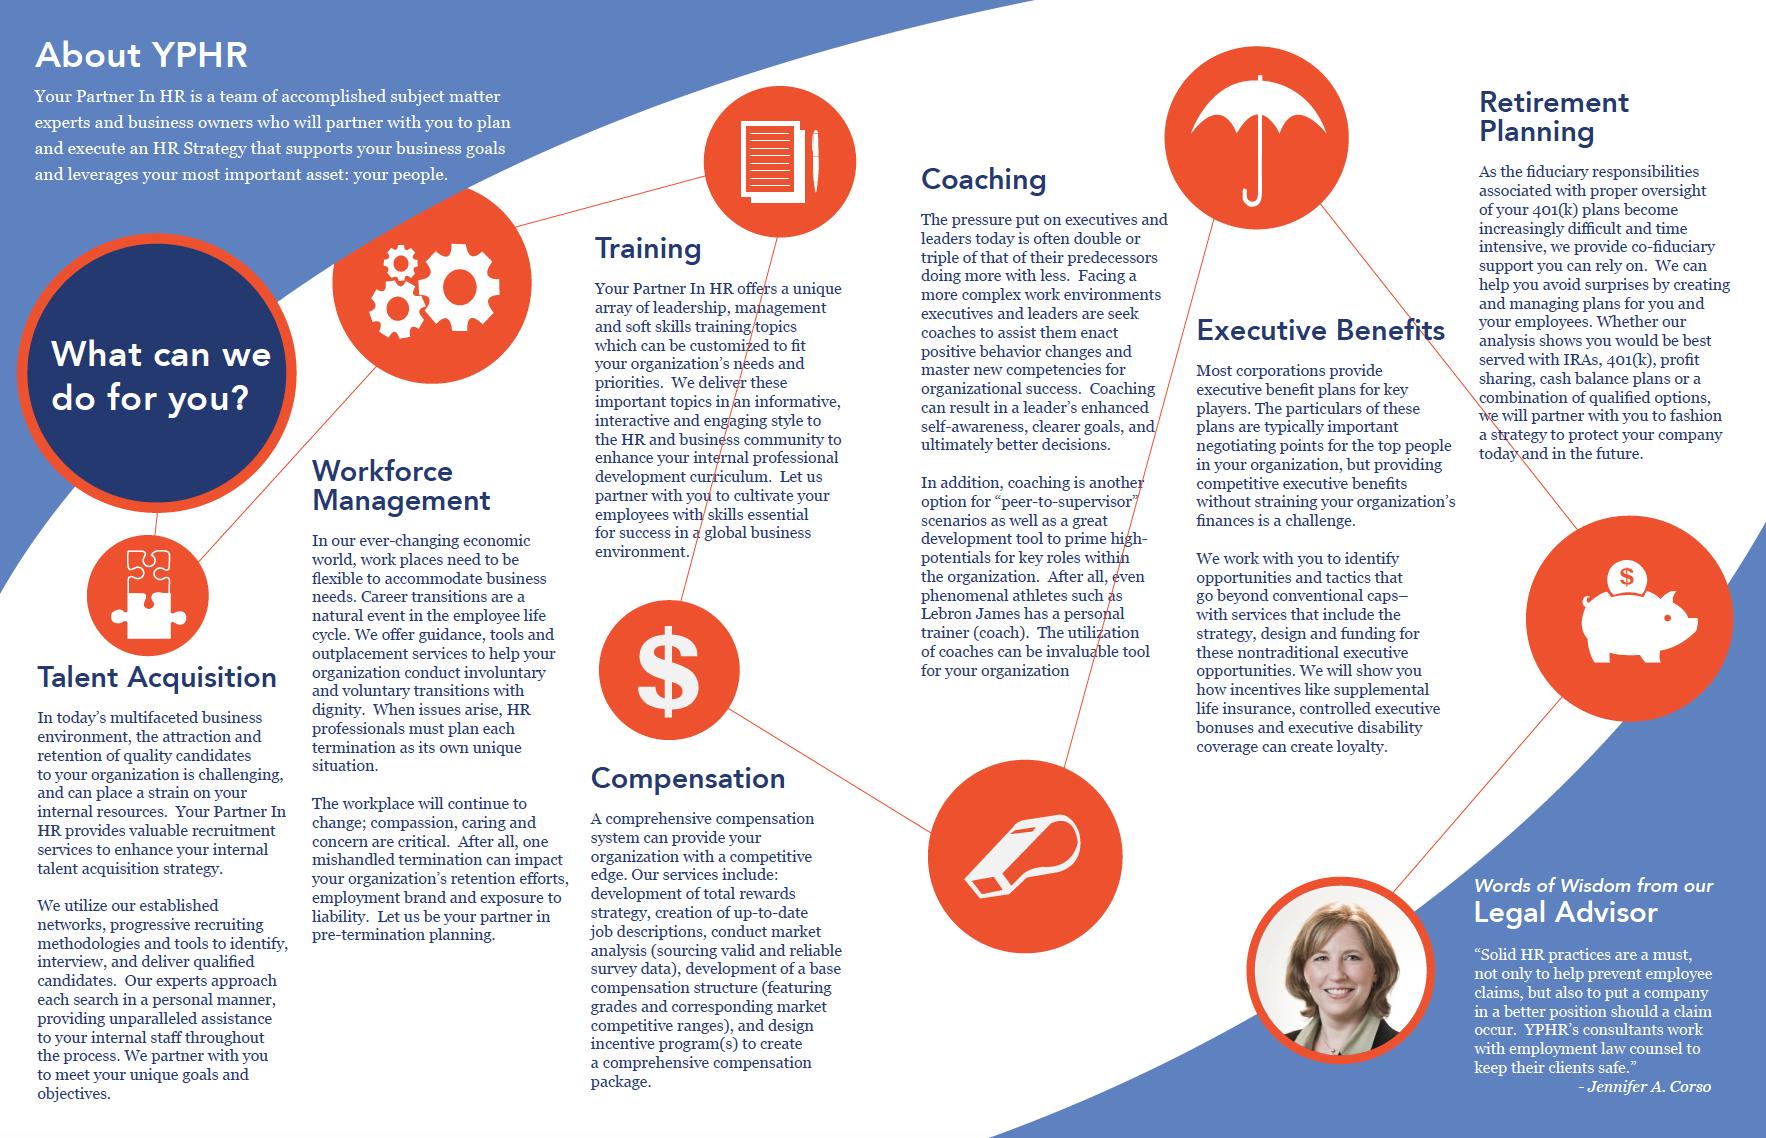 Design - Print, web, and logo design services